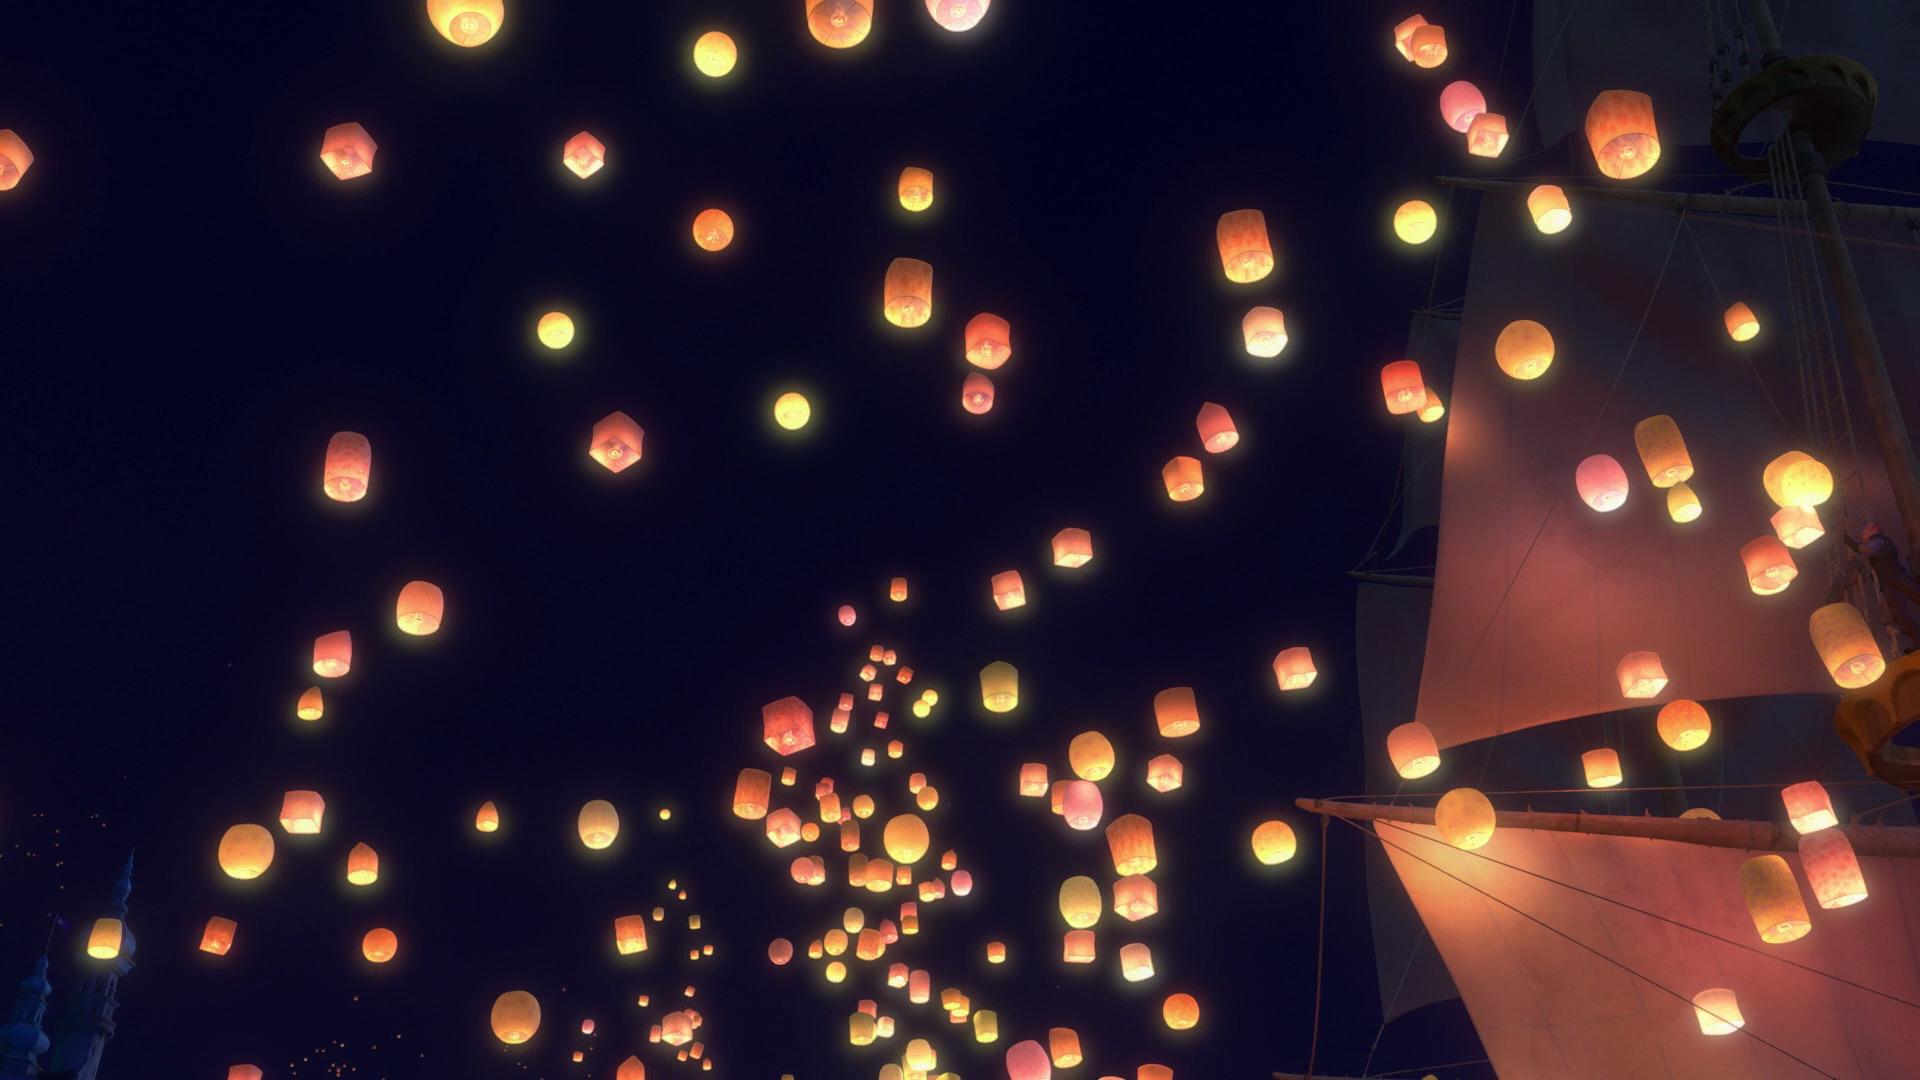 ♕ SPIRIT BRINGERS: EMPYREAN REALM. (SAGA DE BYNQUISTERR) - Página 17 Sky_of_lanterns